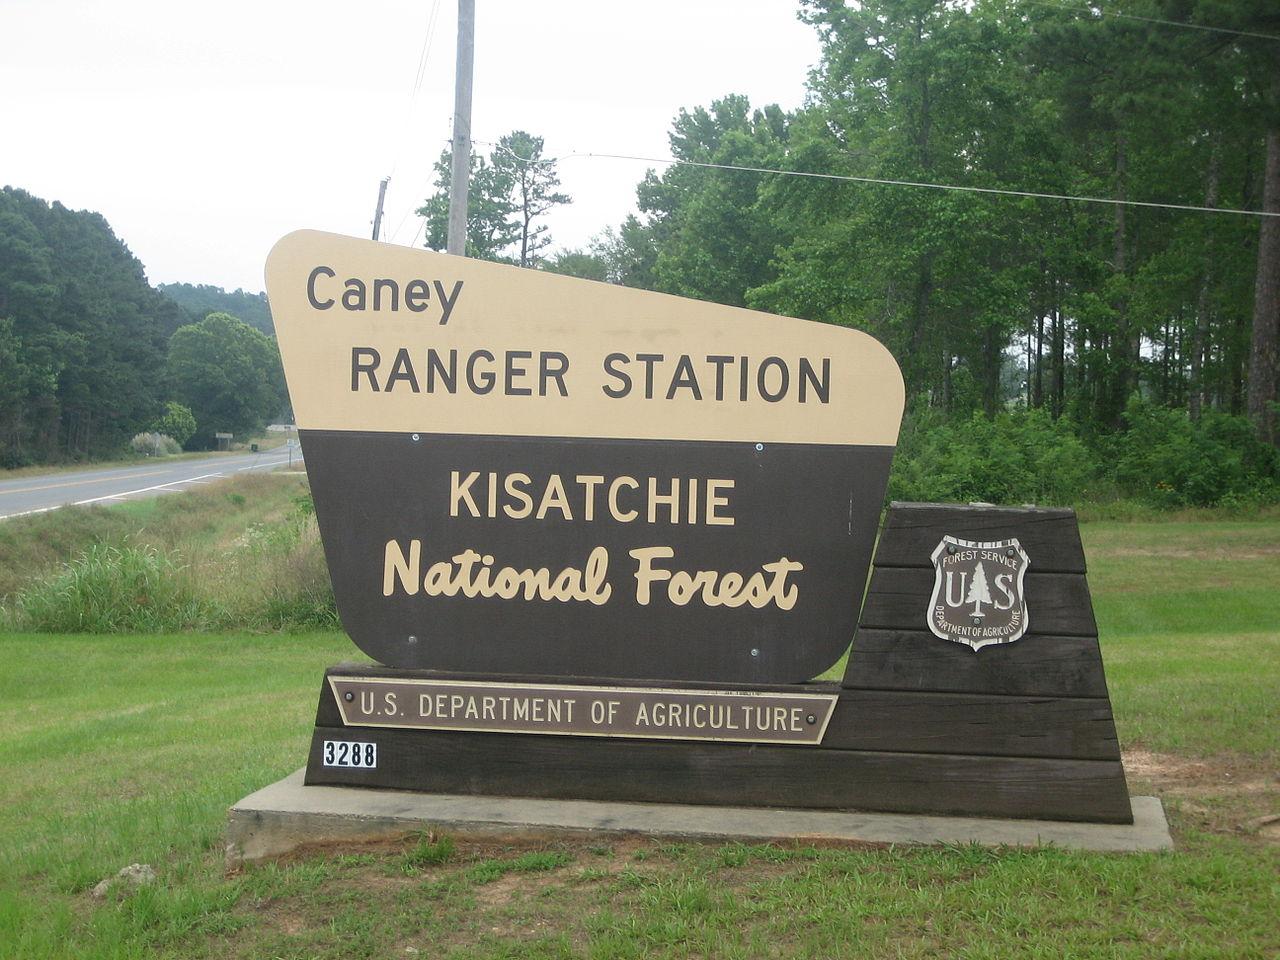 Kisatchie National Forest - Weekend Getaway in Louisiana